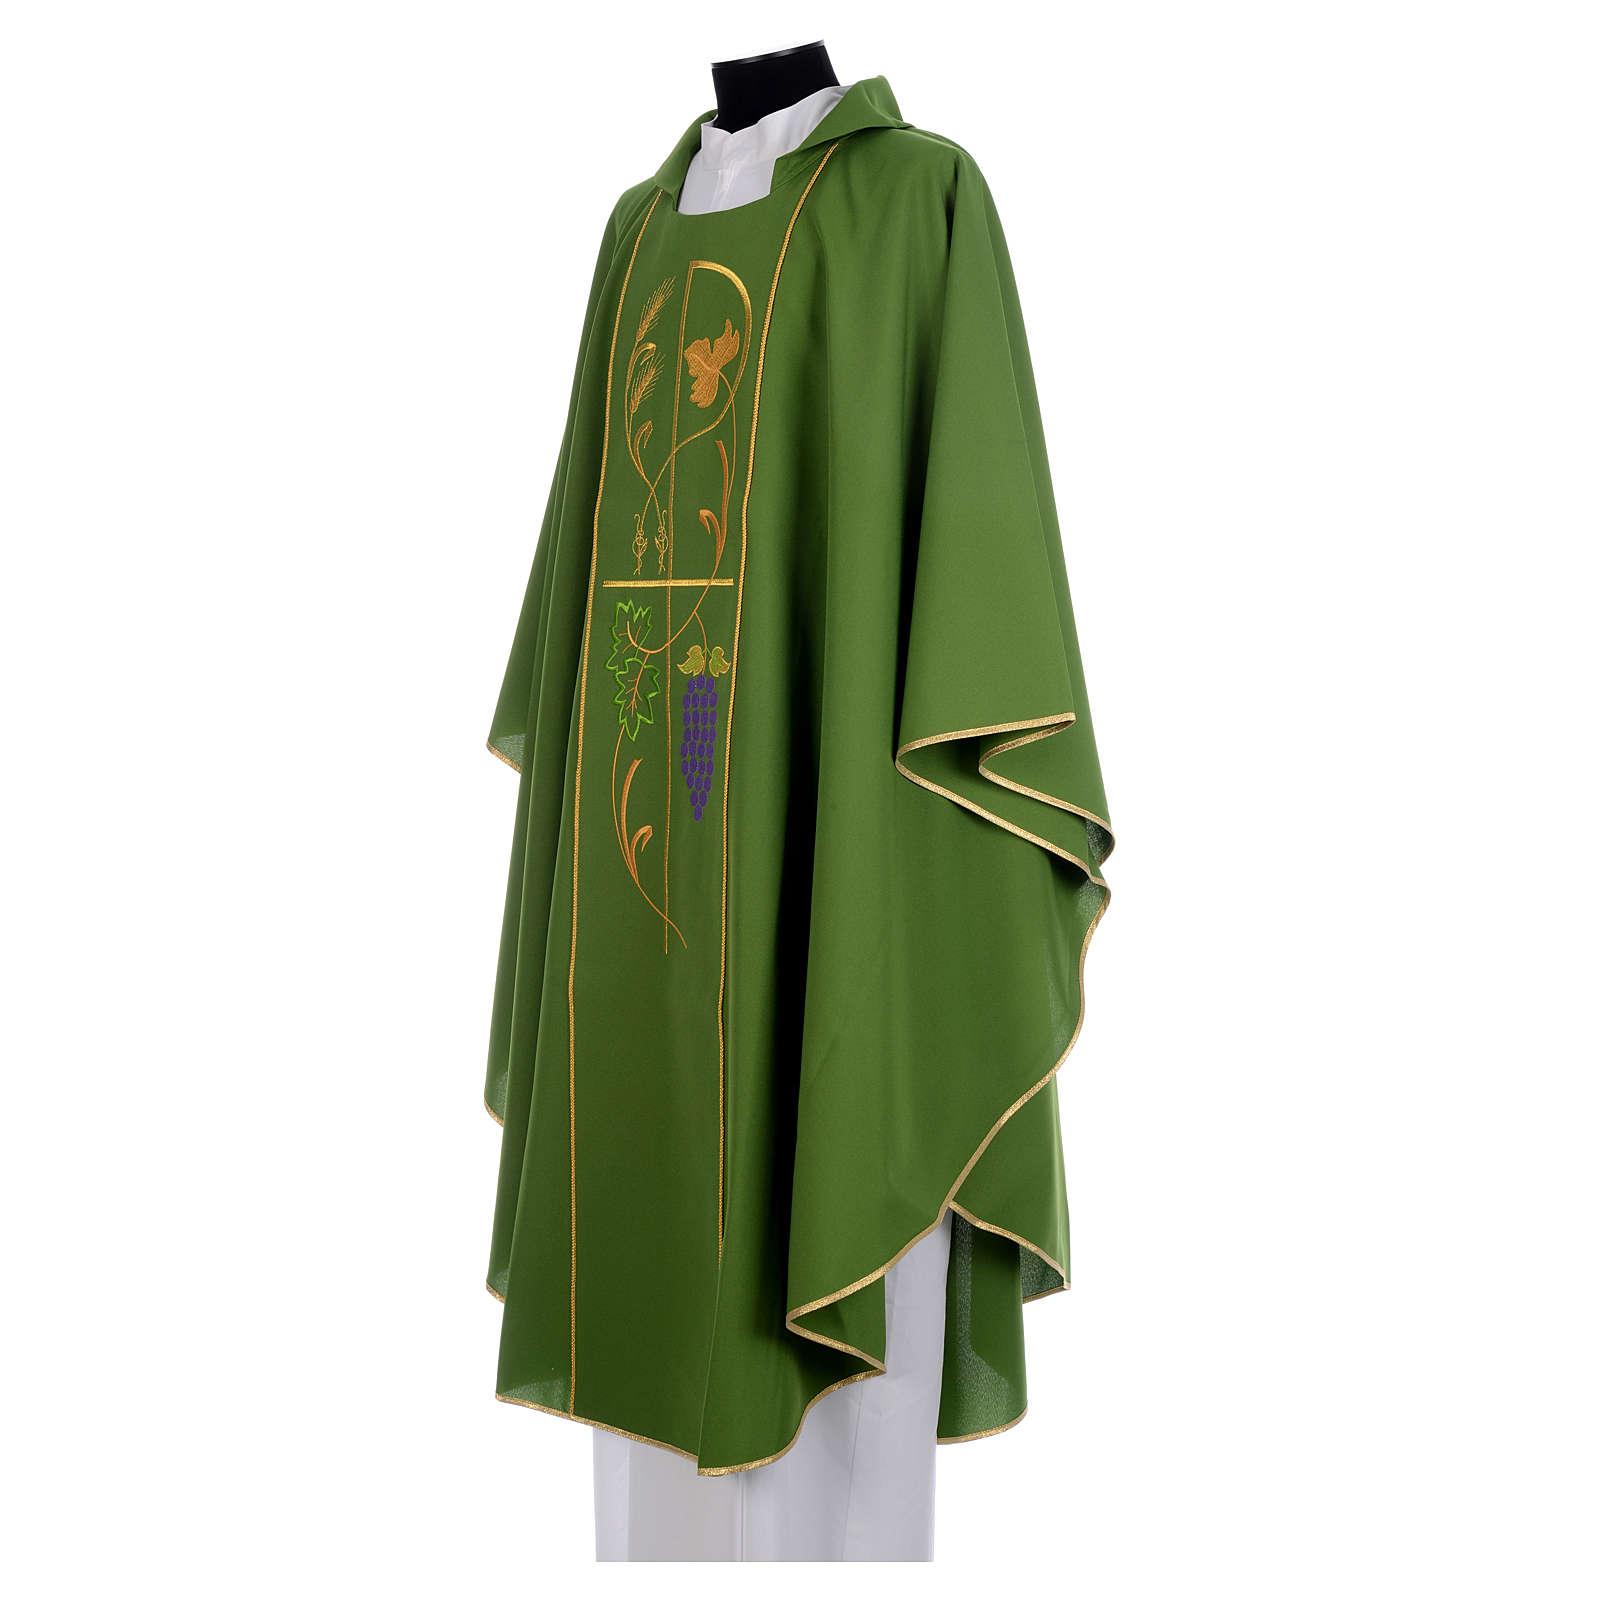 Casulla sacerdotal 100% pol XP uva espigas 4